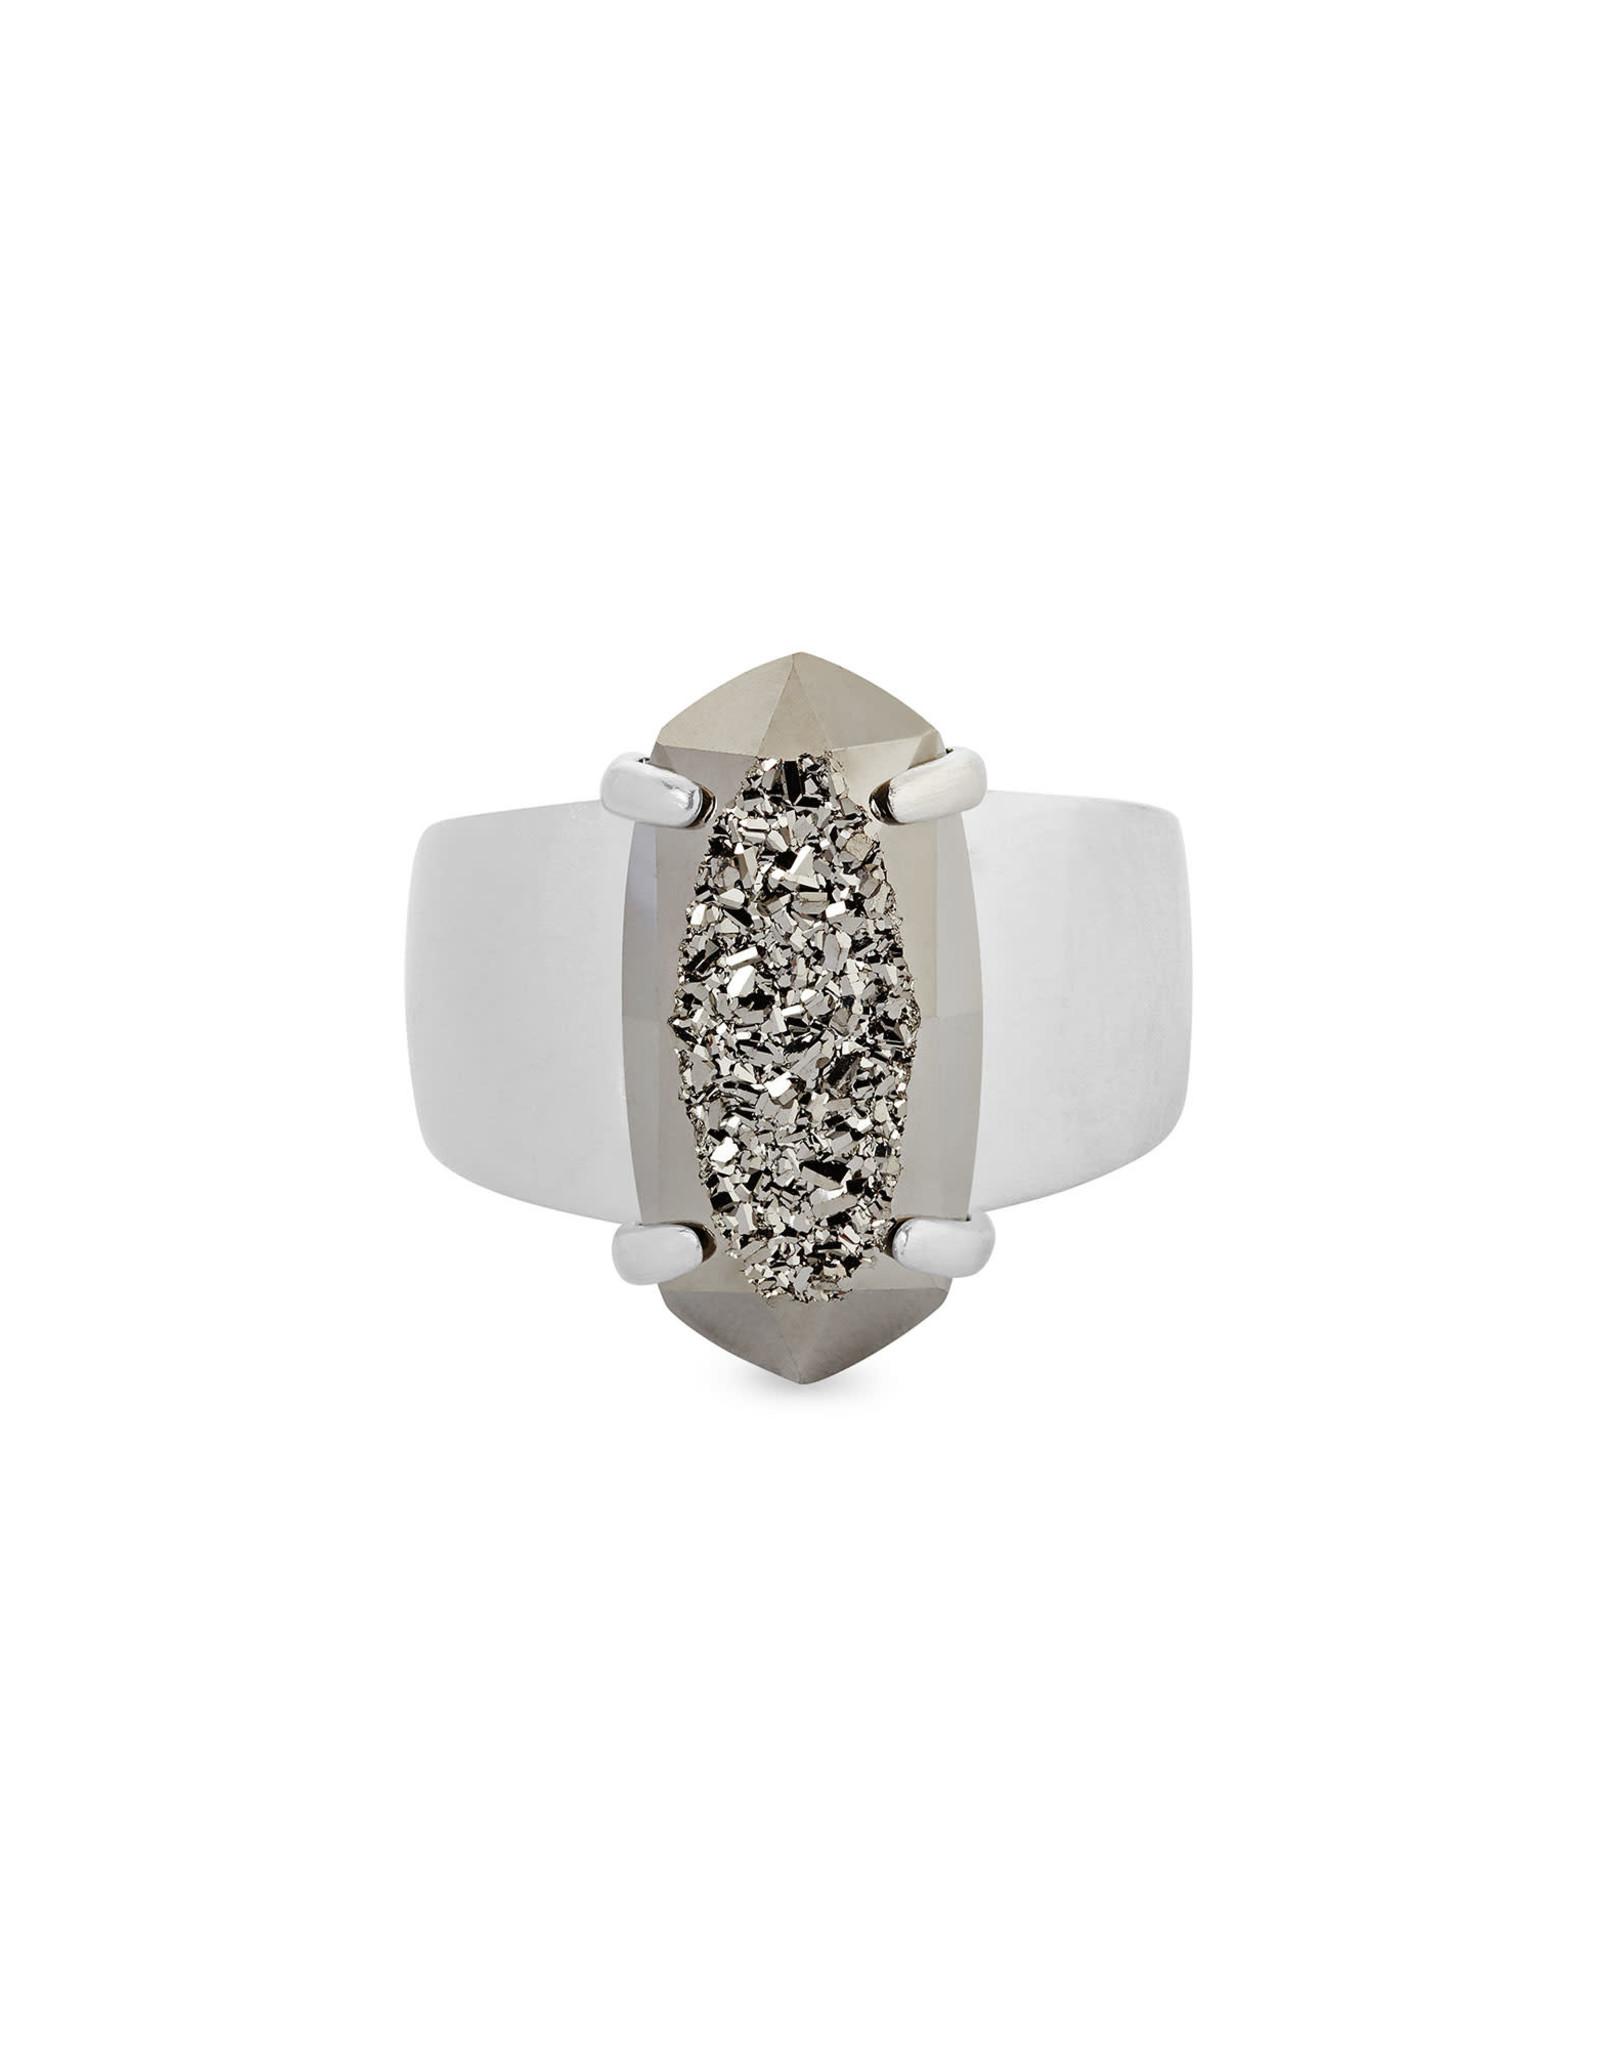 Kendra Scott Harrison Cocktail Ring - Platinum Drusy/Rhodium Size 7